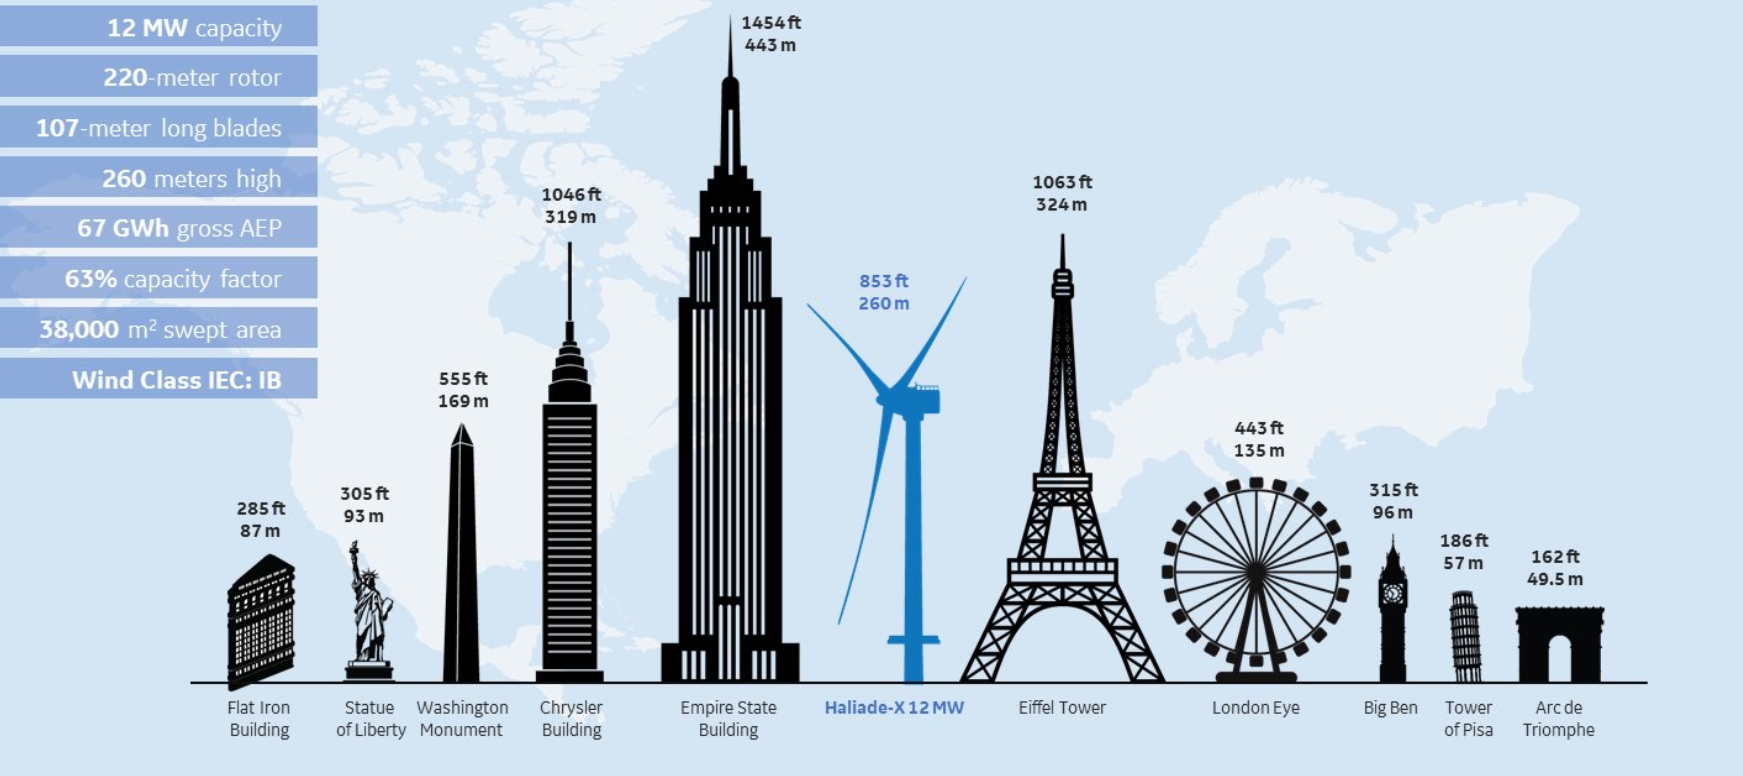 GE_turbine_éolienne_mer